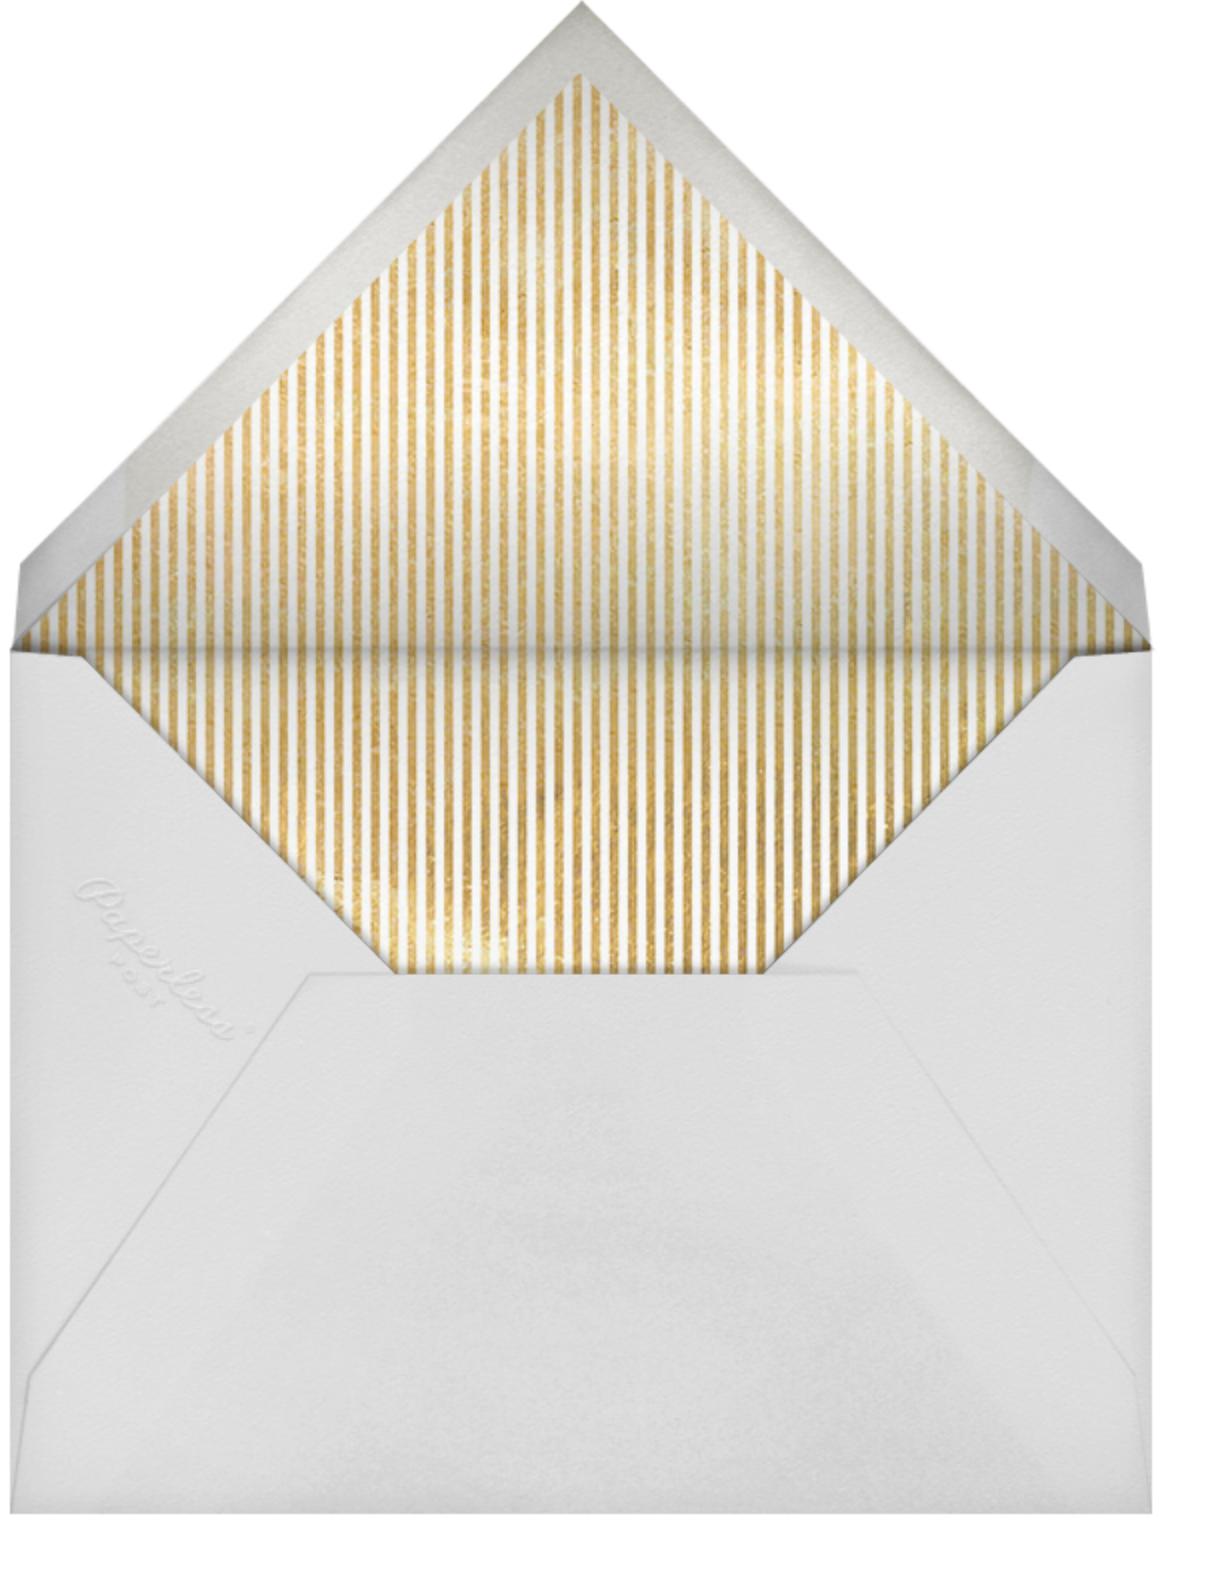 Milestone Dots (Thirty) - Gray - Sugar Paper - Adult birthday - envelope back